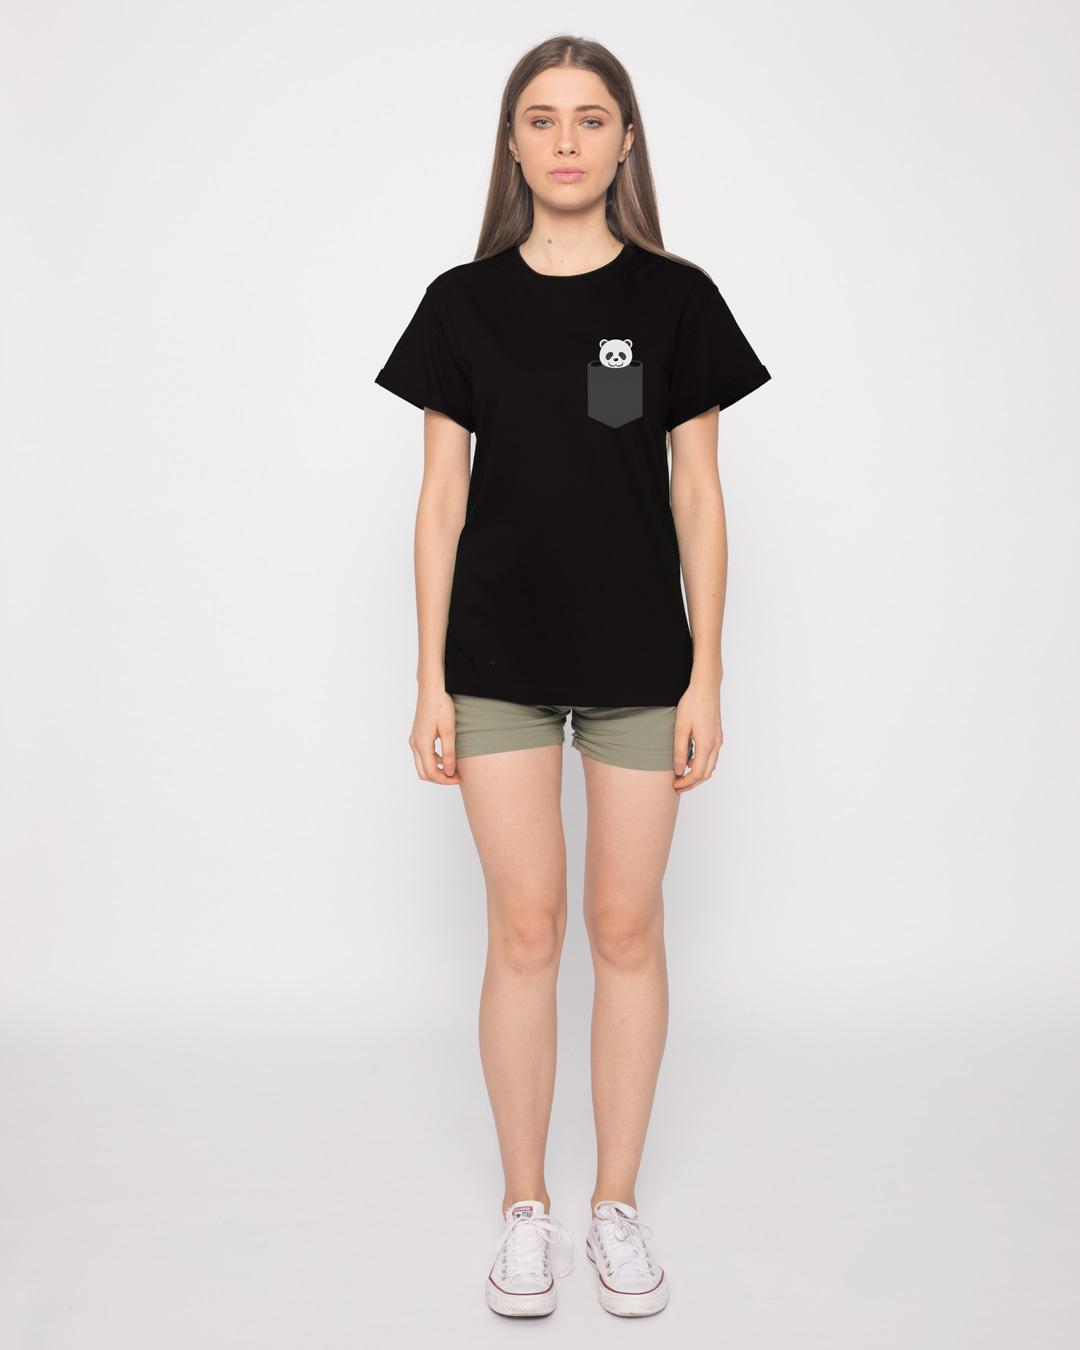 10b03d5b7 Buy Pocket Panda Printed Half Sleeve Boyfriend T-Shirt For Women Online  India   Bewakoof.com